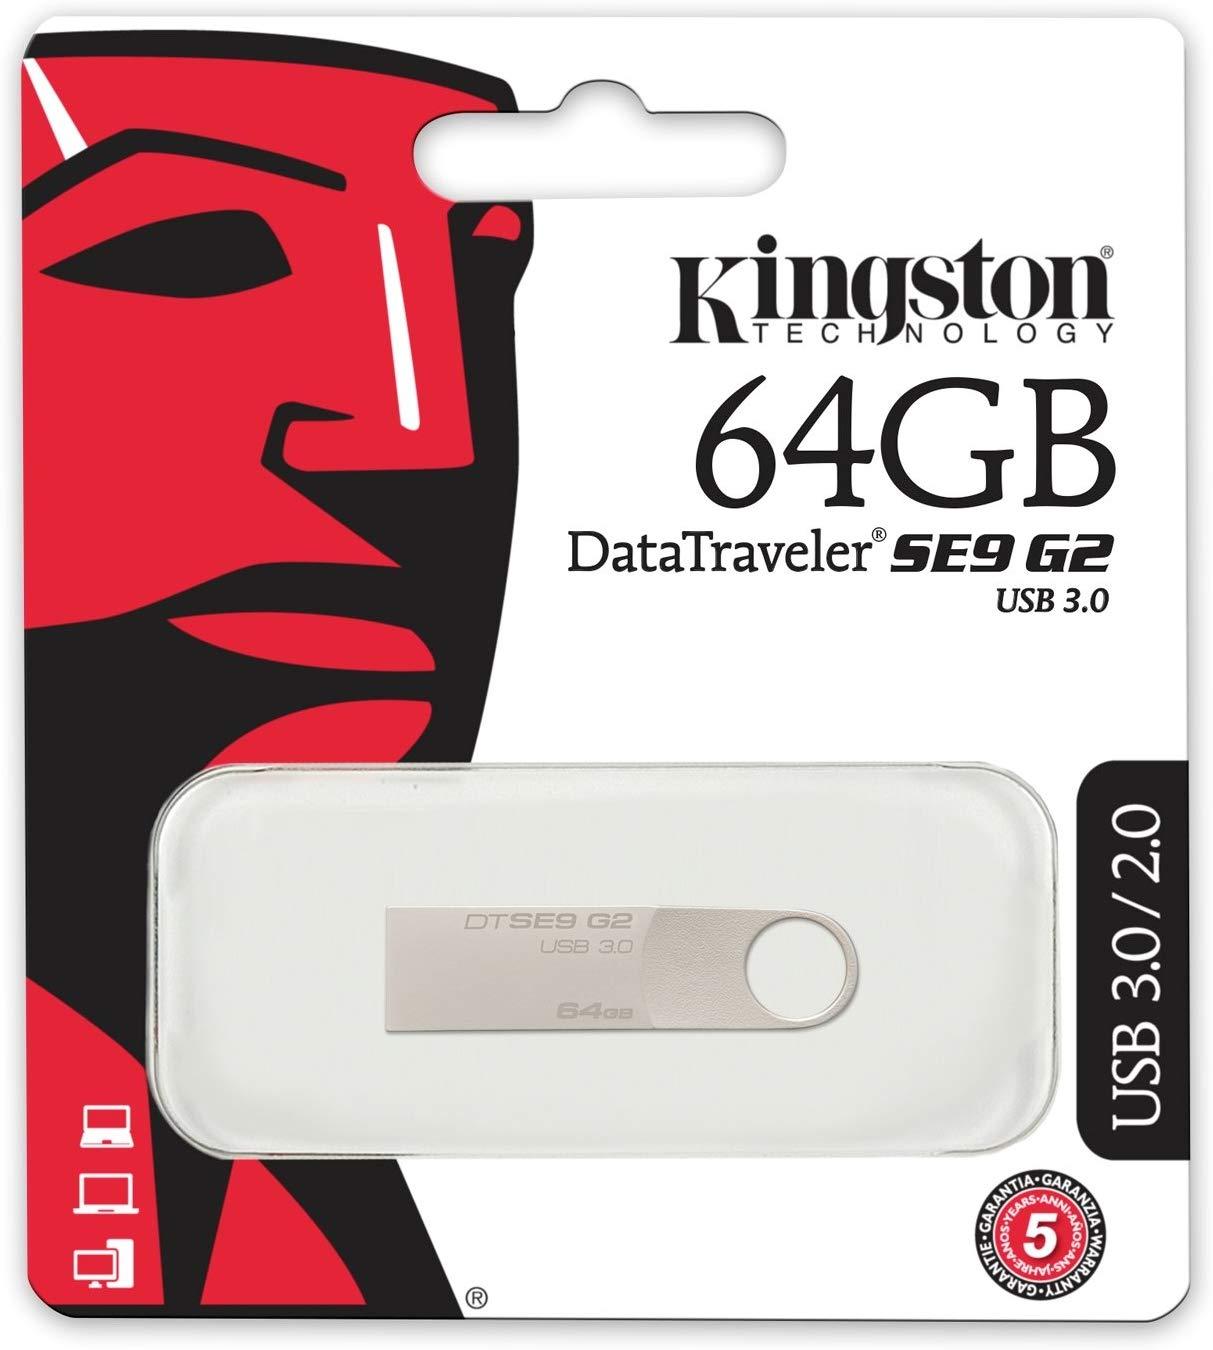 Kingston 64GB DataTraveler SE9 G2 USB 3.0 Flash Drive - 100MB/s